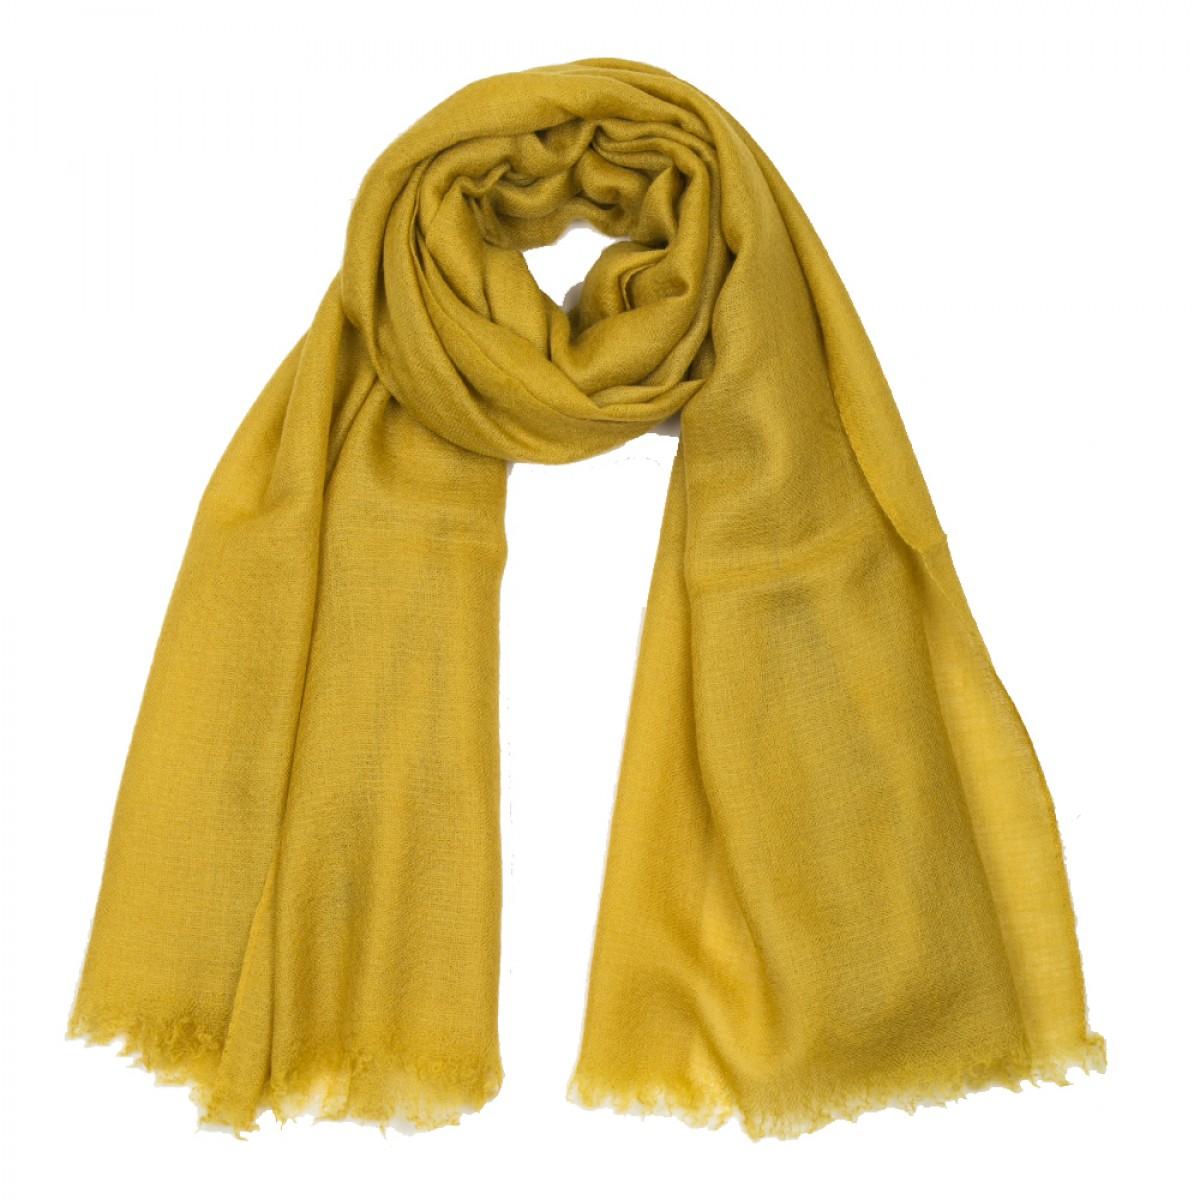 Plain Pashmina Stole - Mustard Yellow